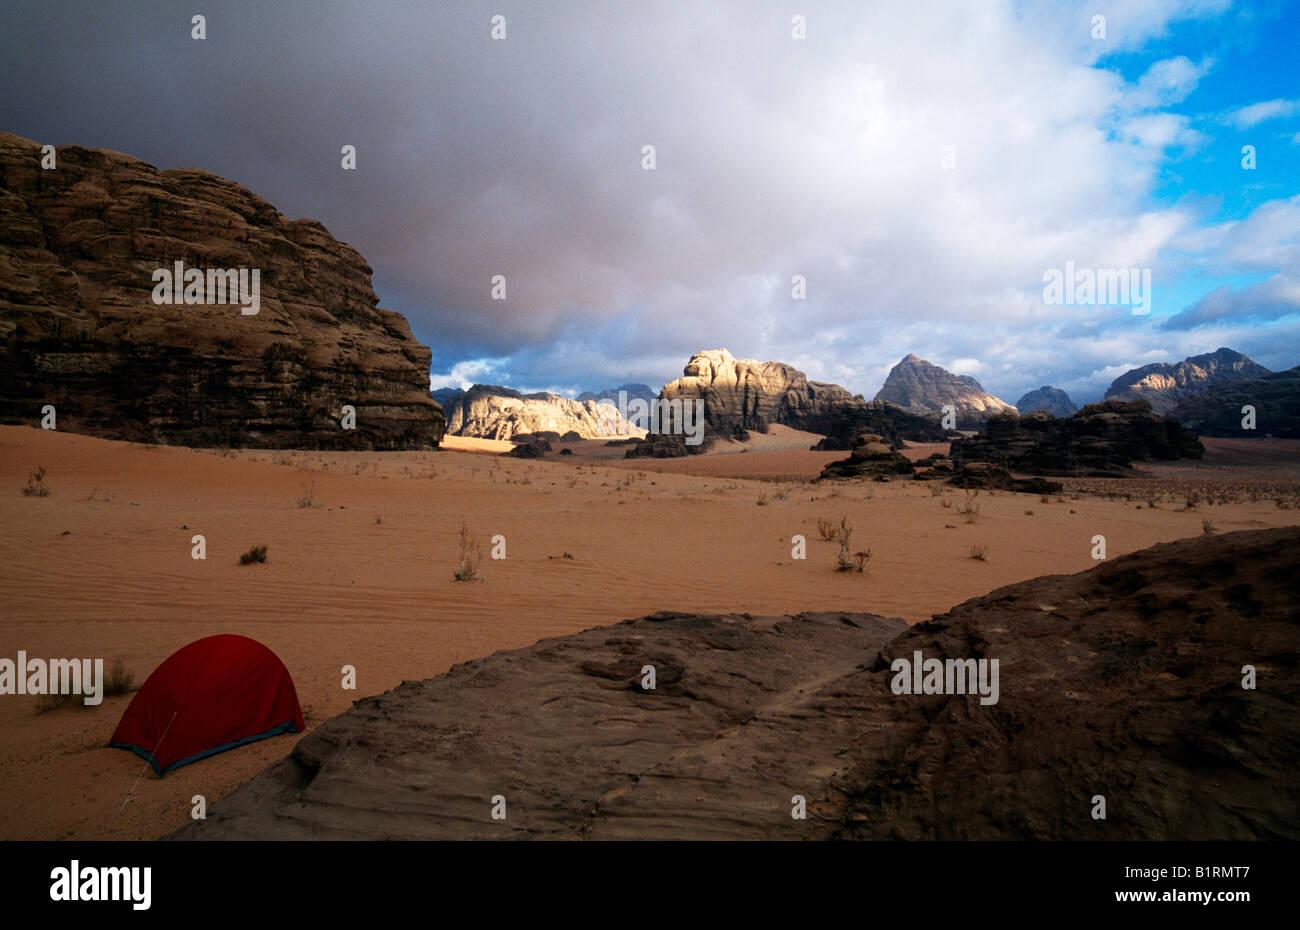 Camping, Wadi Rum, Jordanien, Asien Stockbild